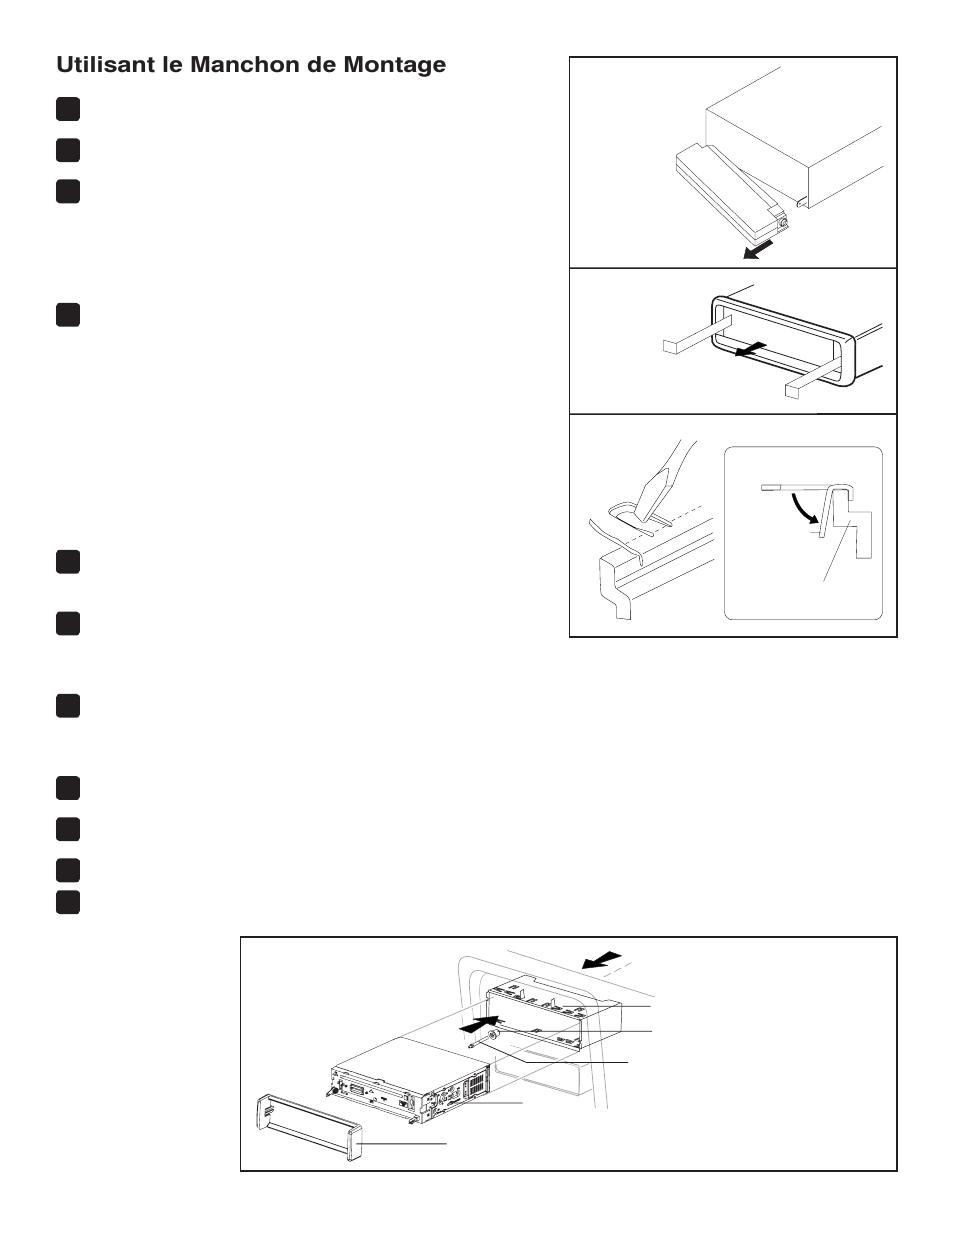 utilisant le manchon de montage jensen vm8113 user manual page rh manualsdir com Clip Art User Guide User Manual